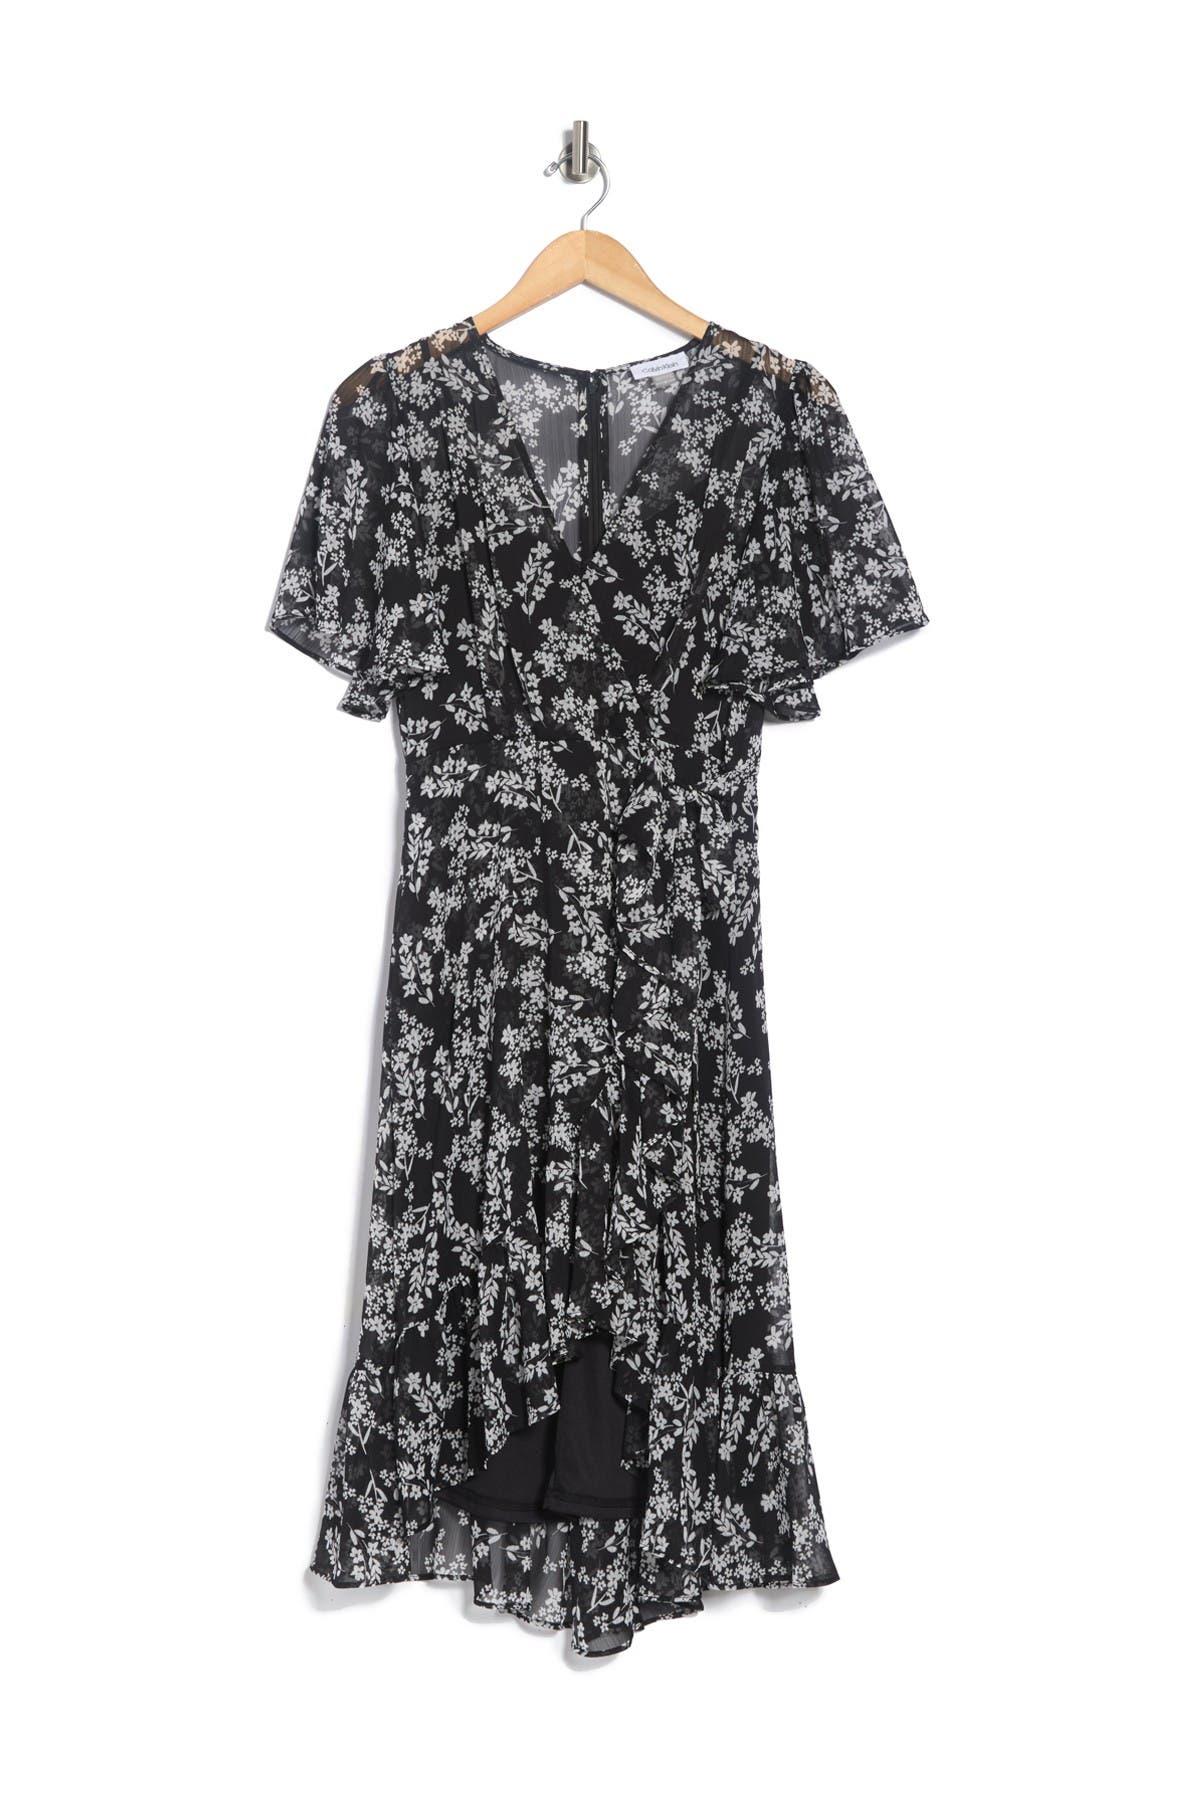 Image of Calvin Klein Ditsy Floral Waist Tie Dress